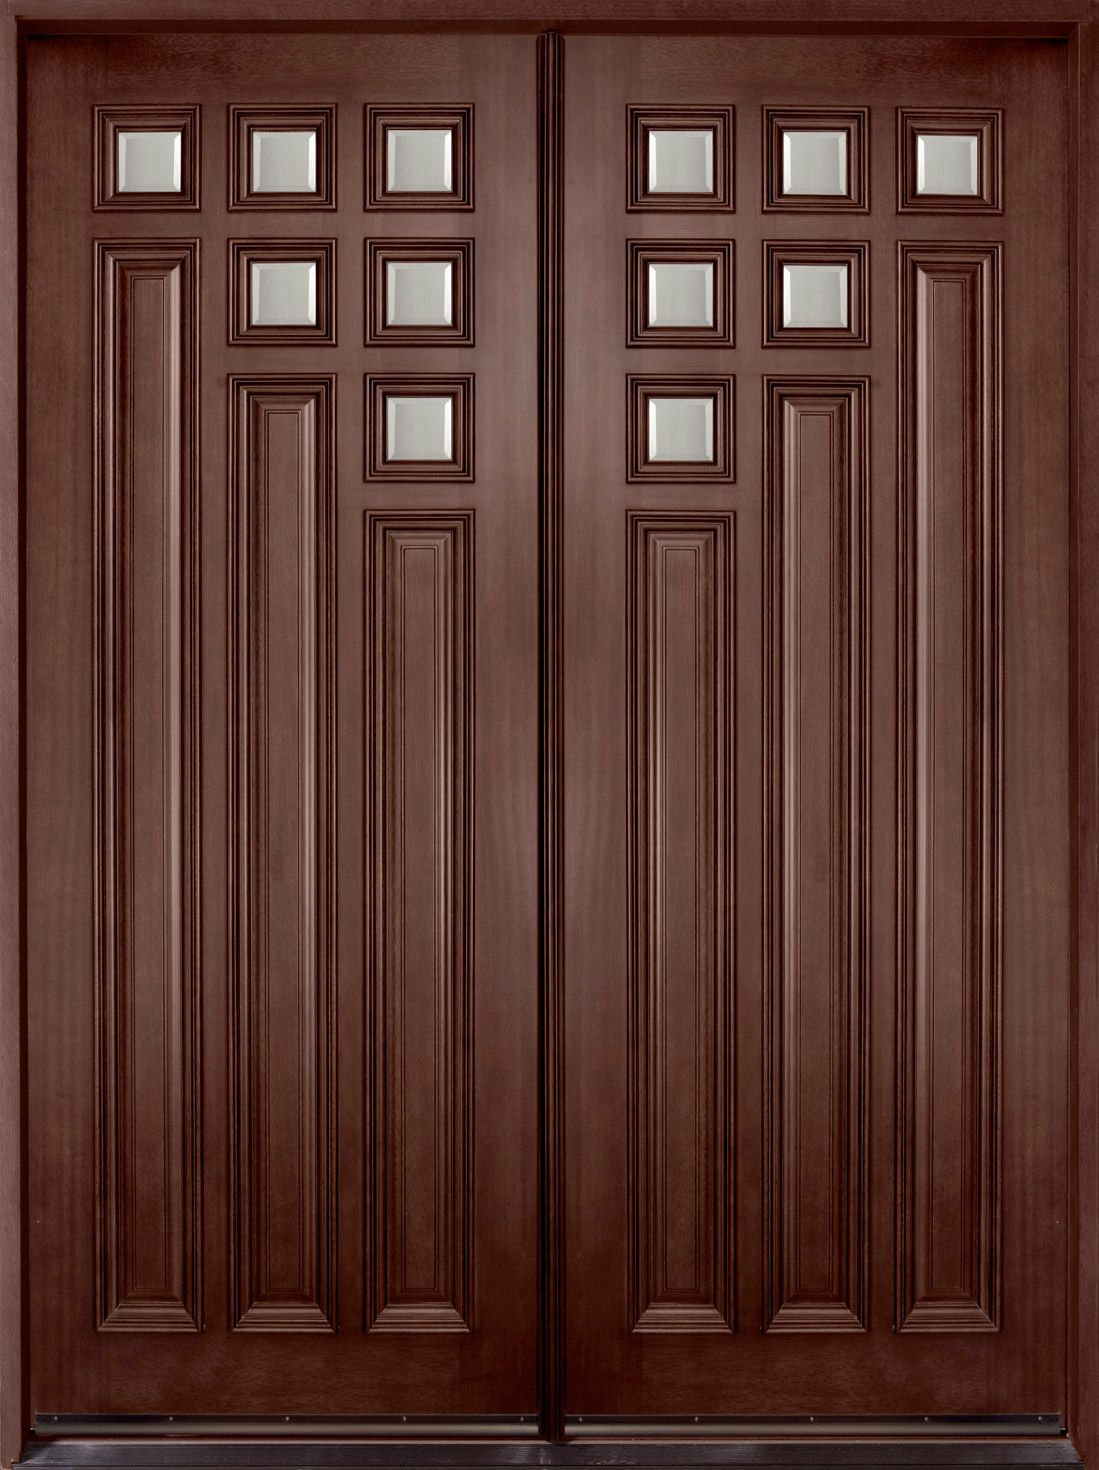 Wooden Double Door Designs For Houses Modern Front Double